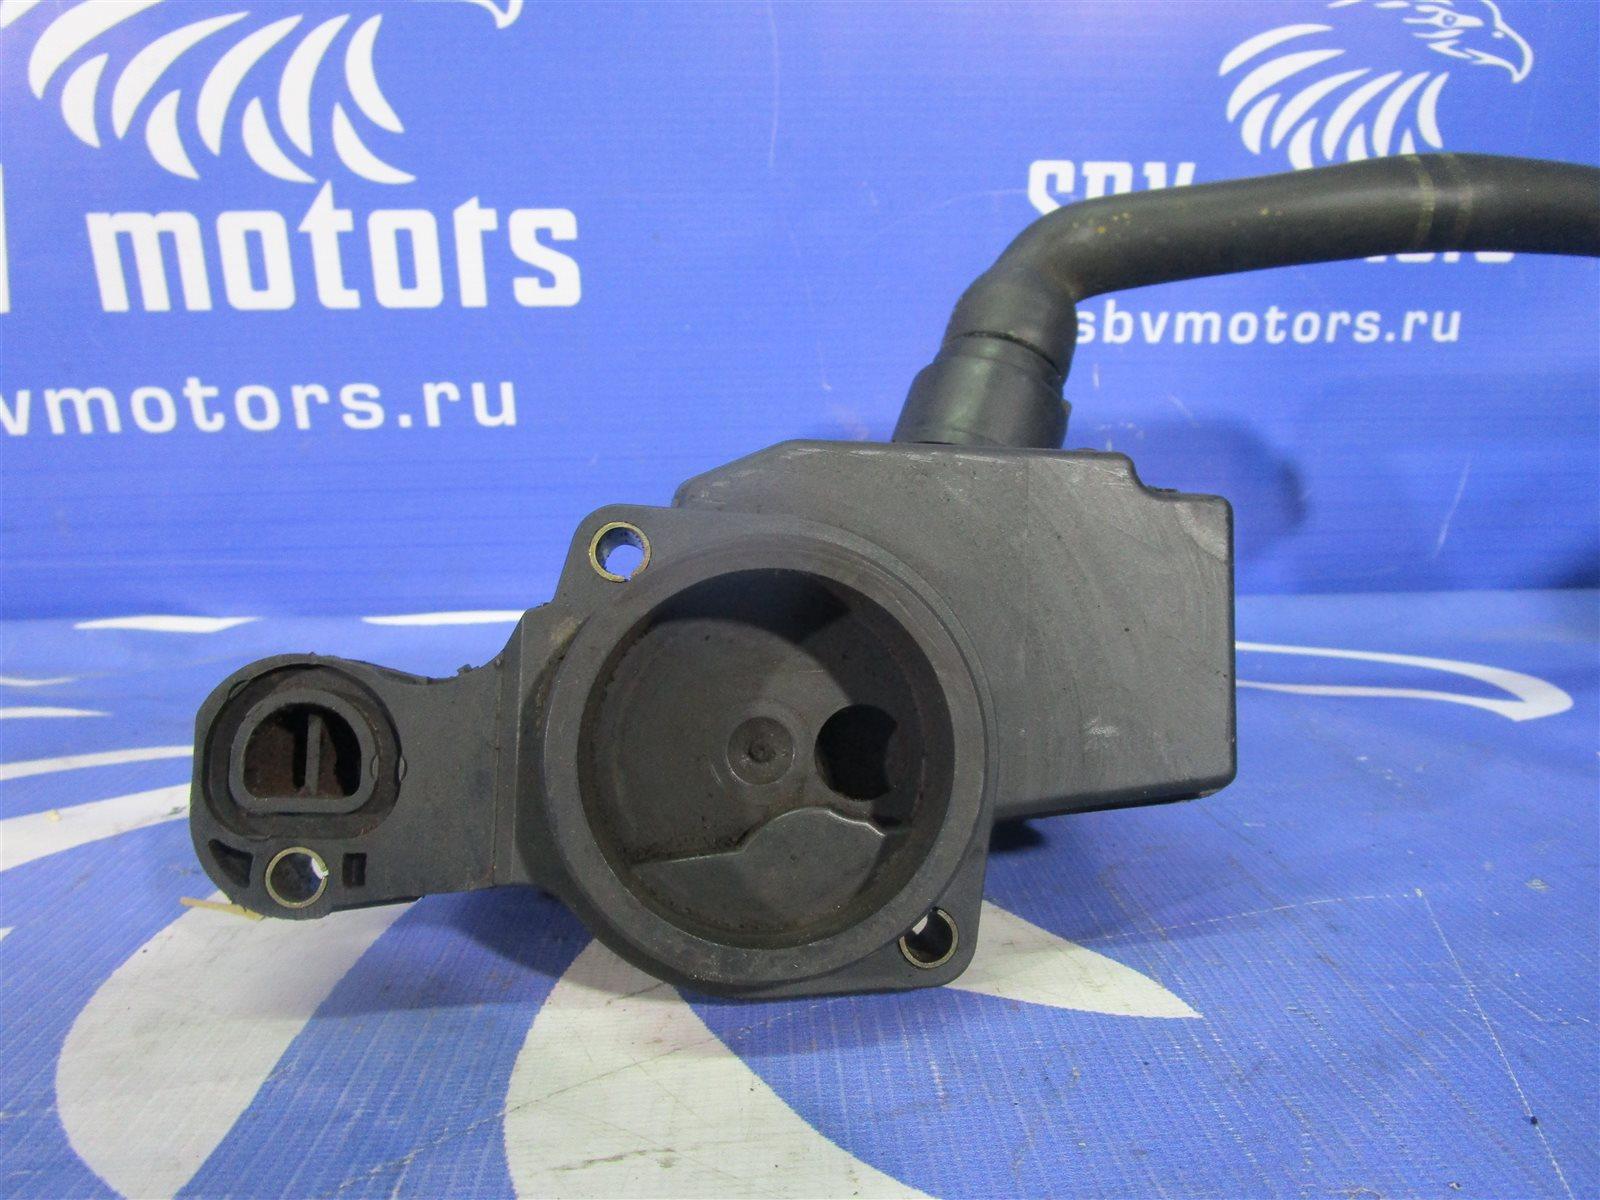 Сепаратор, разделитель масла, клапан pcv, вентиляция картера Volkswagen Polo 6NAHS AHS 1996